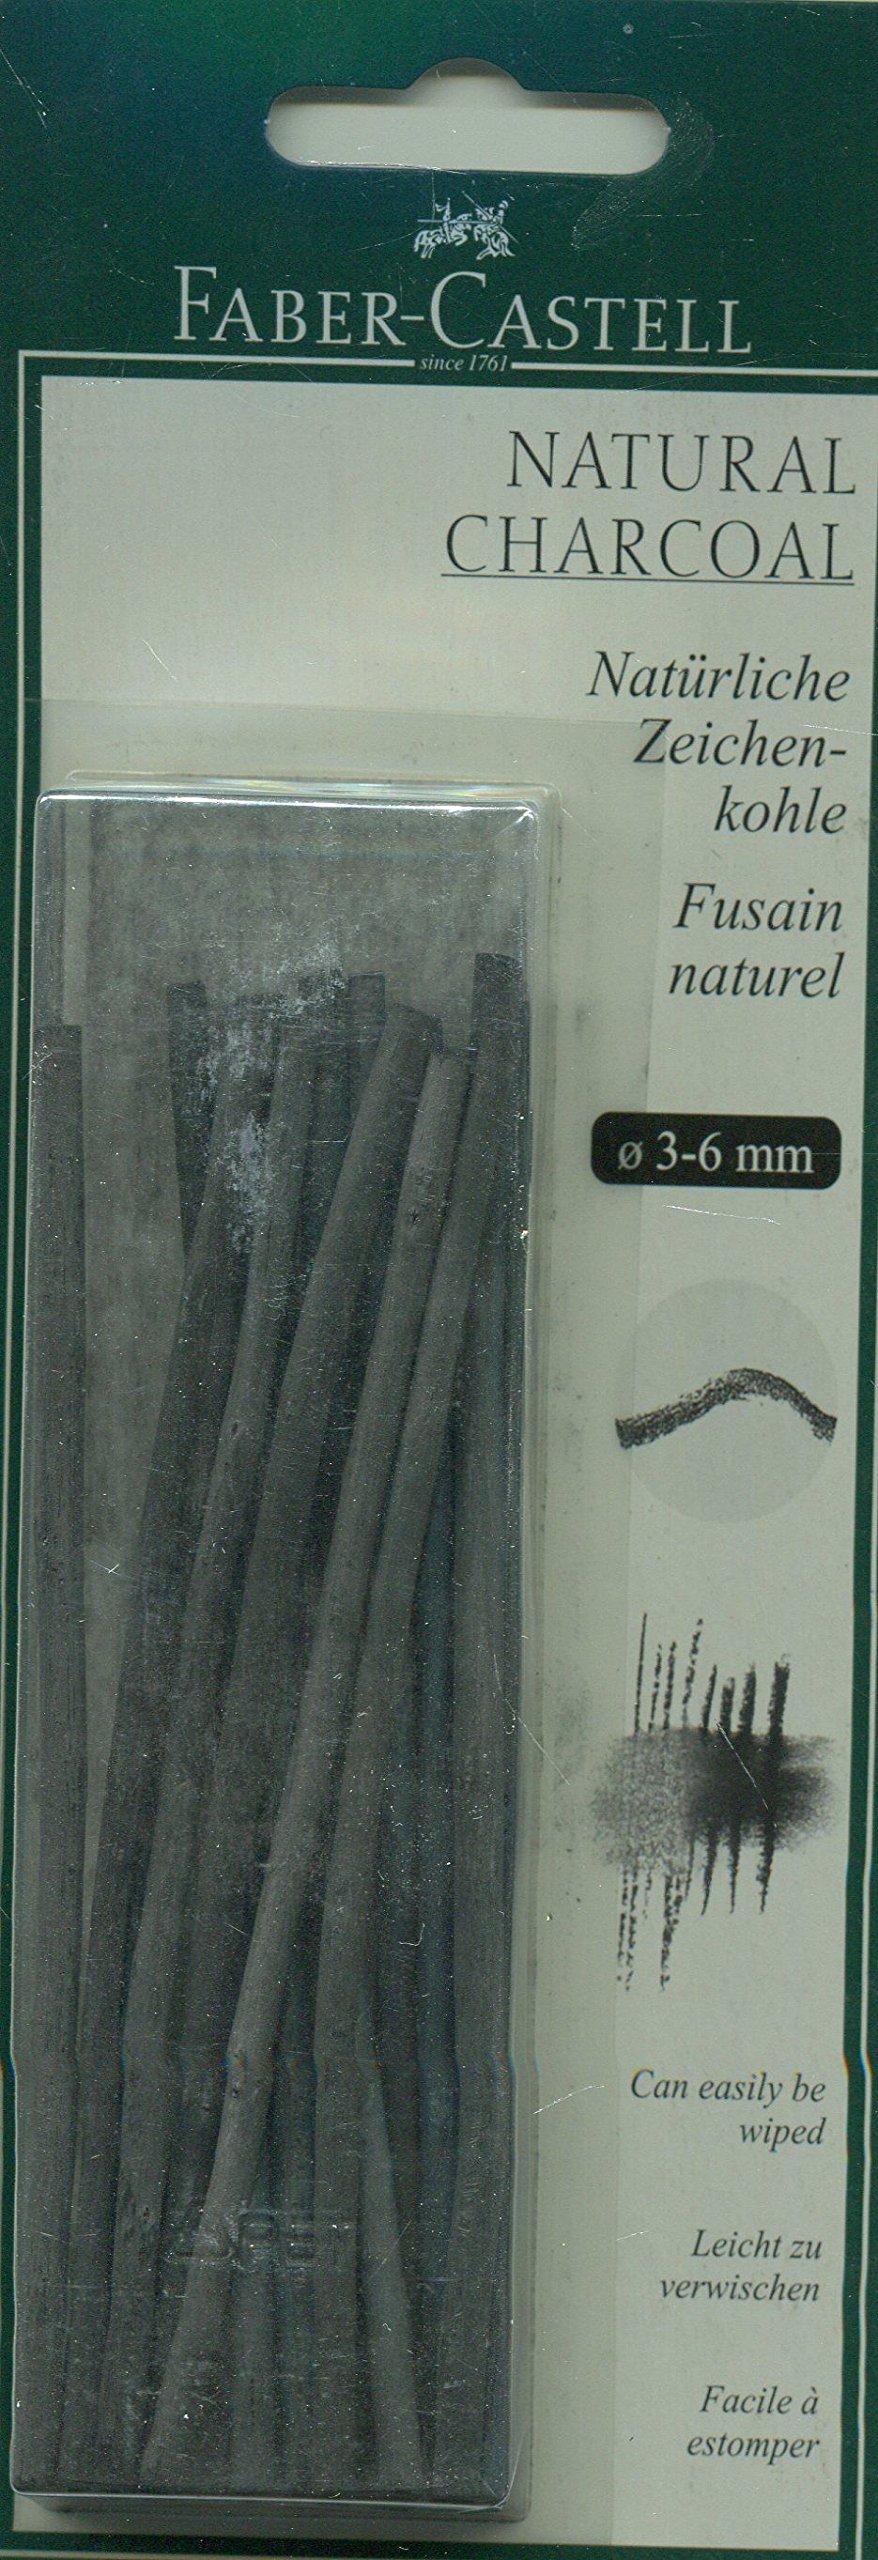 Faber-castell Pitt 3-6mm Natural Charcoal Sticks (pack Of 20)